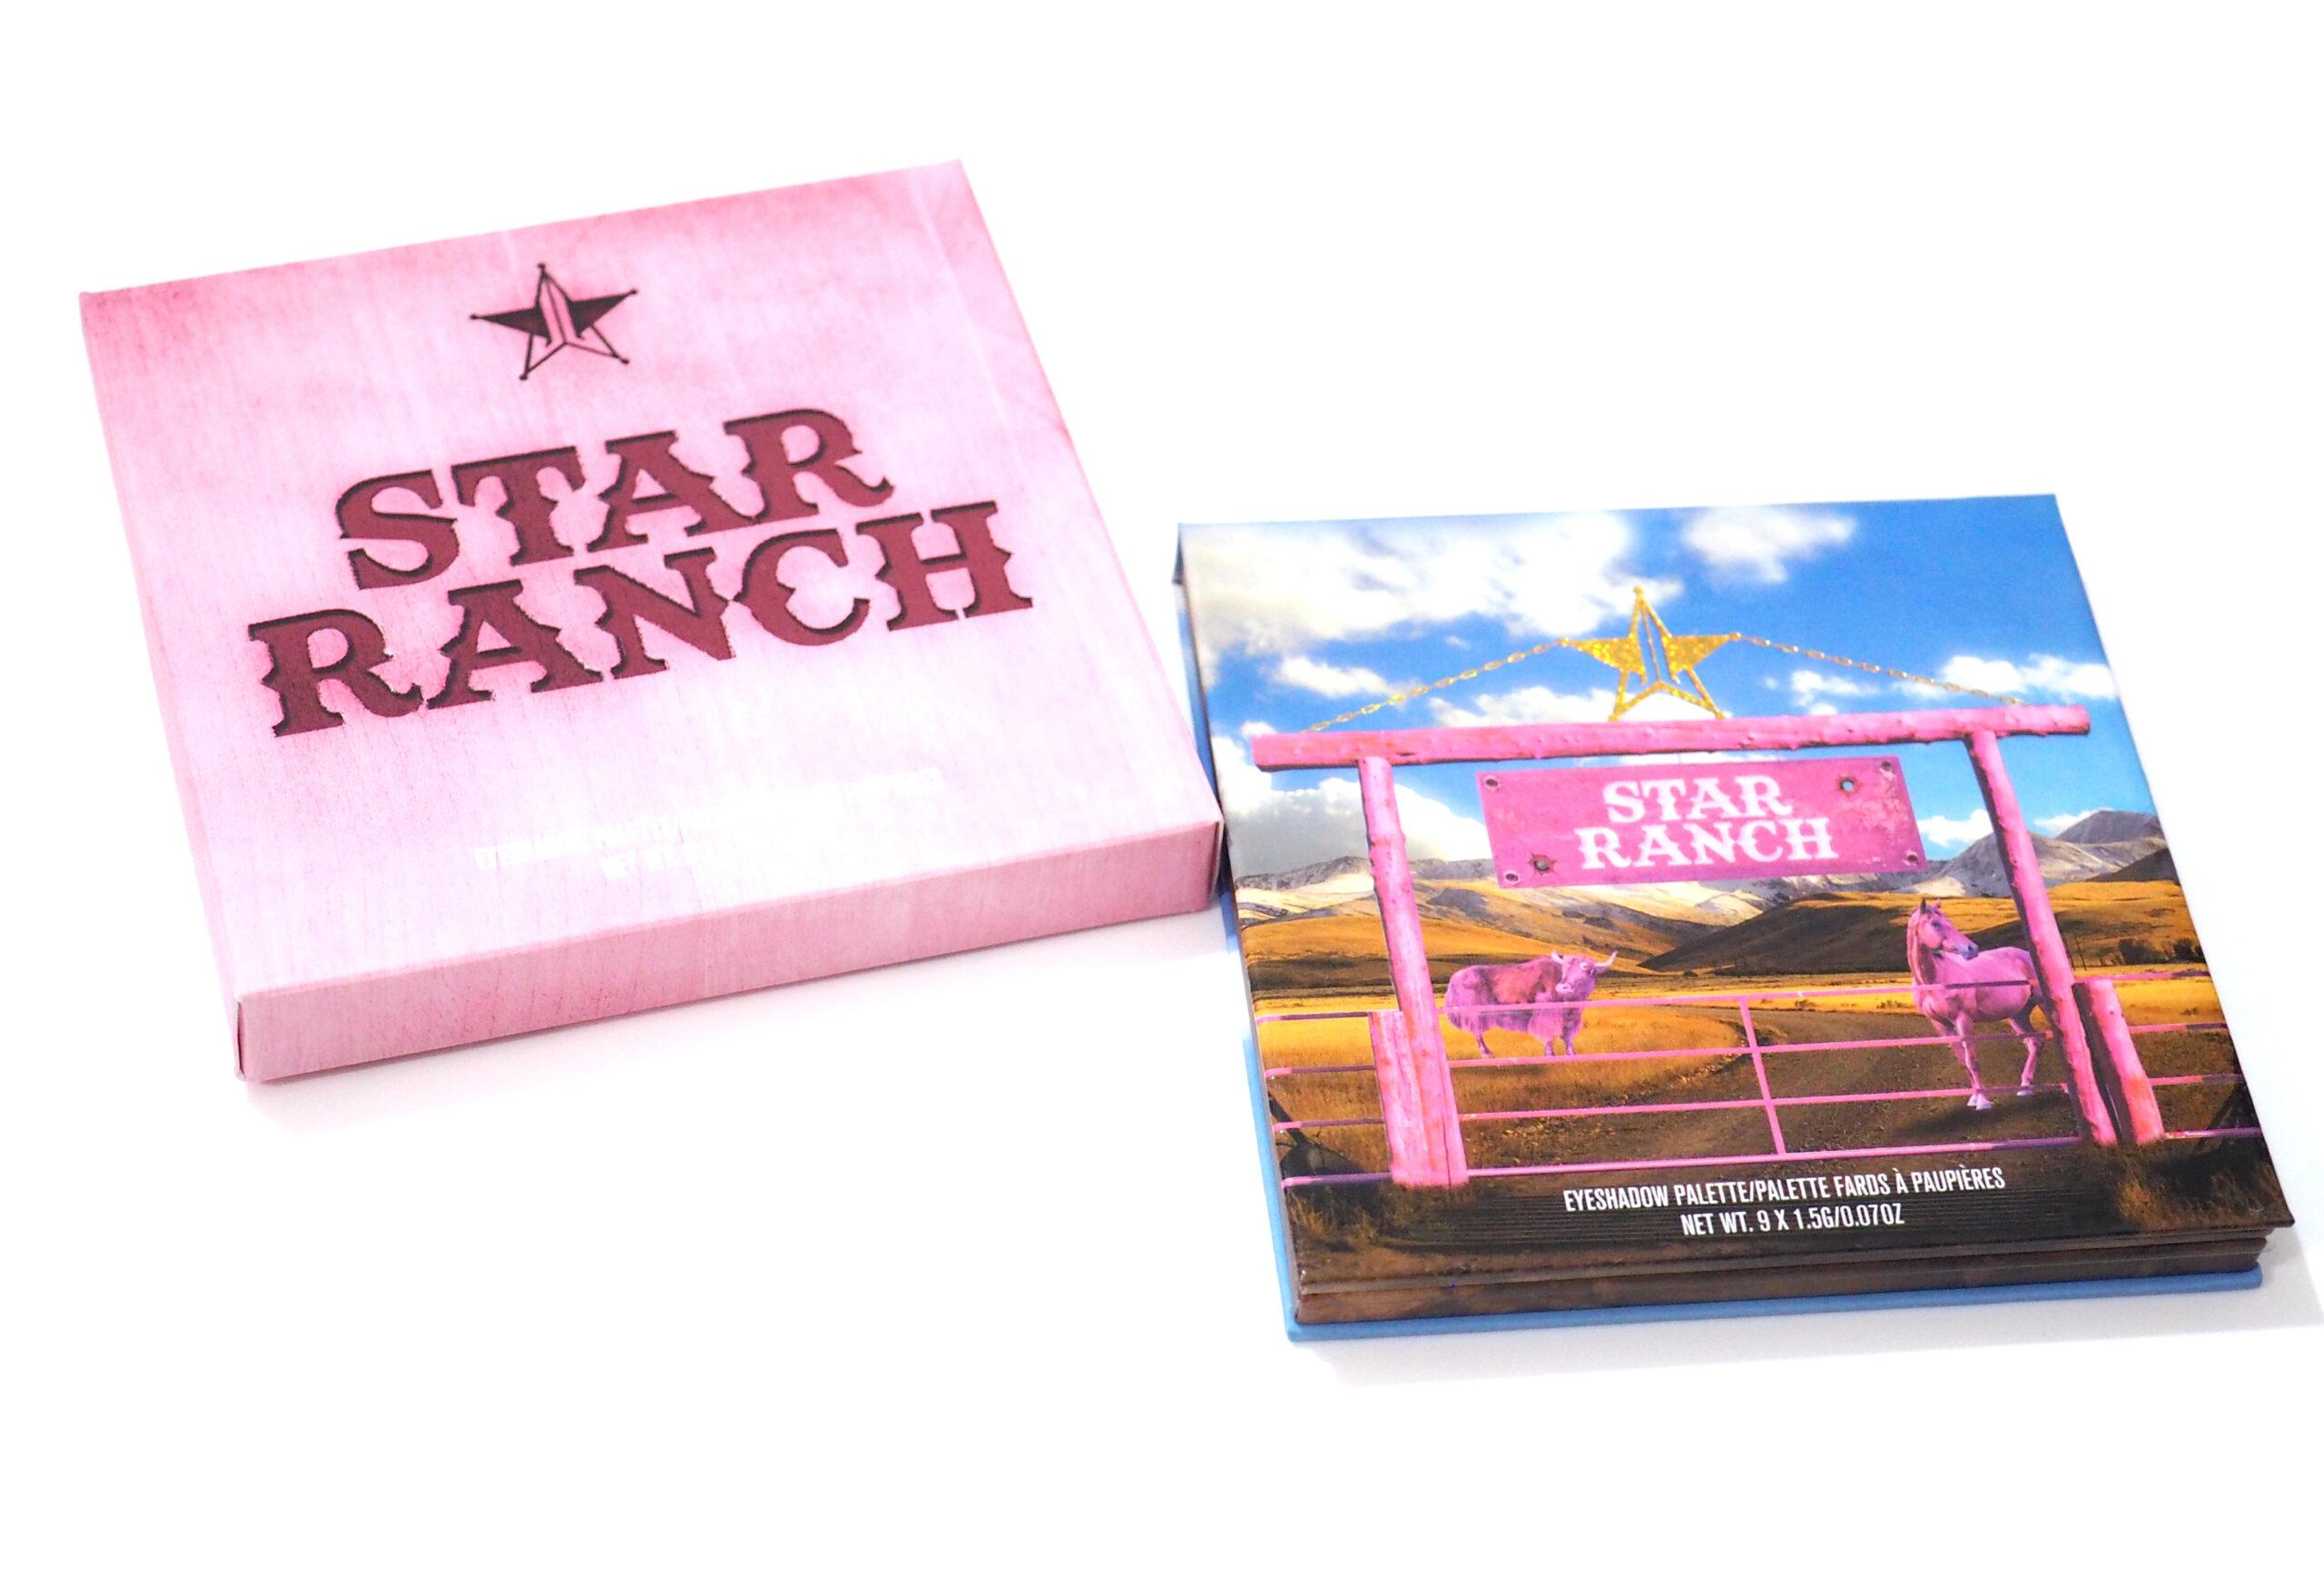 Jeffree Star Cosmetics Premium Summer Mystery Box Unboxing!